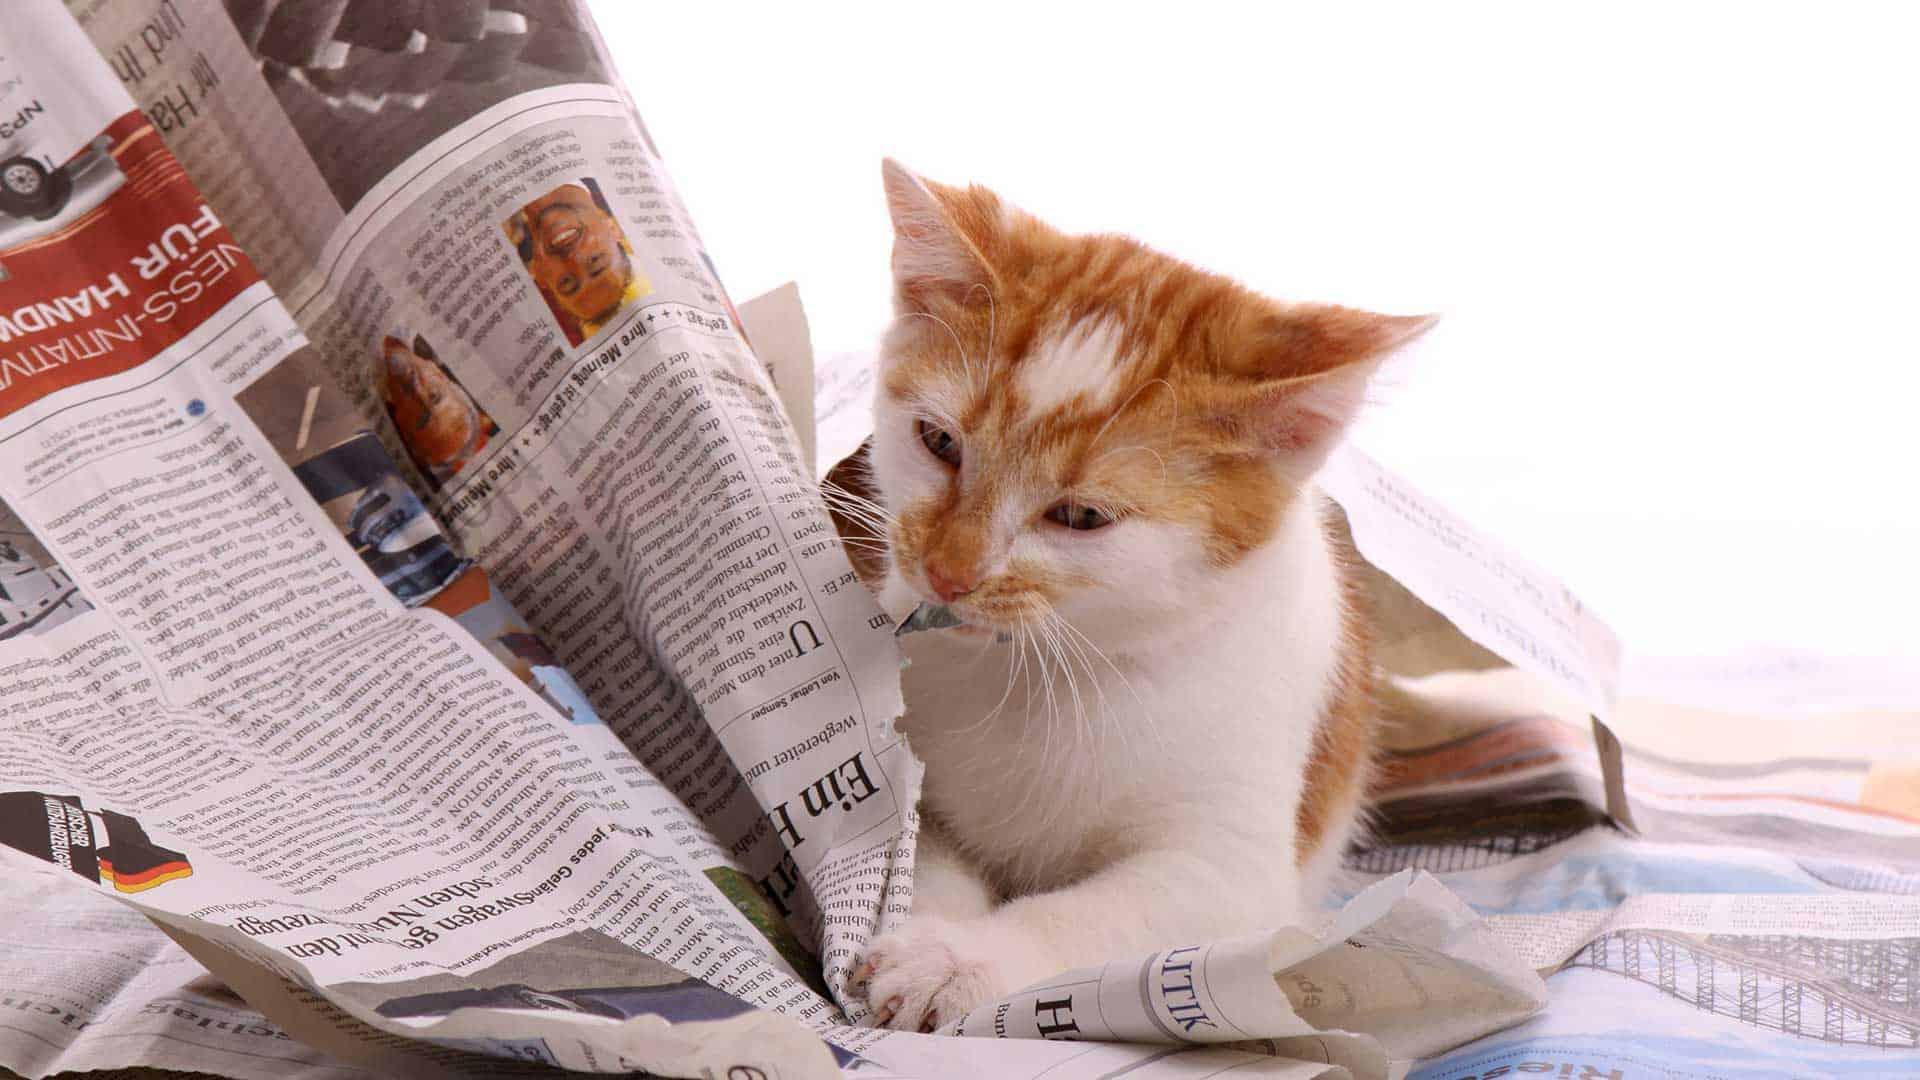 An orange and white tabby kitten reading the newspaper.